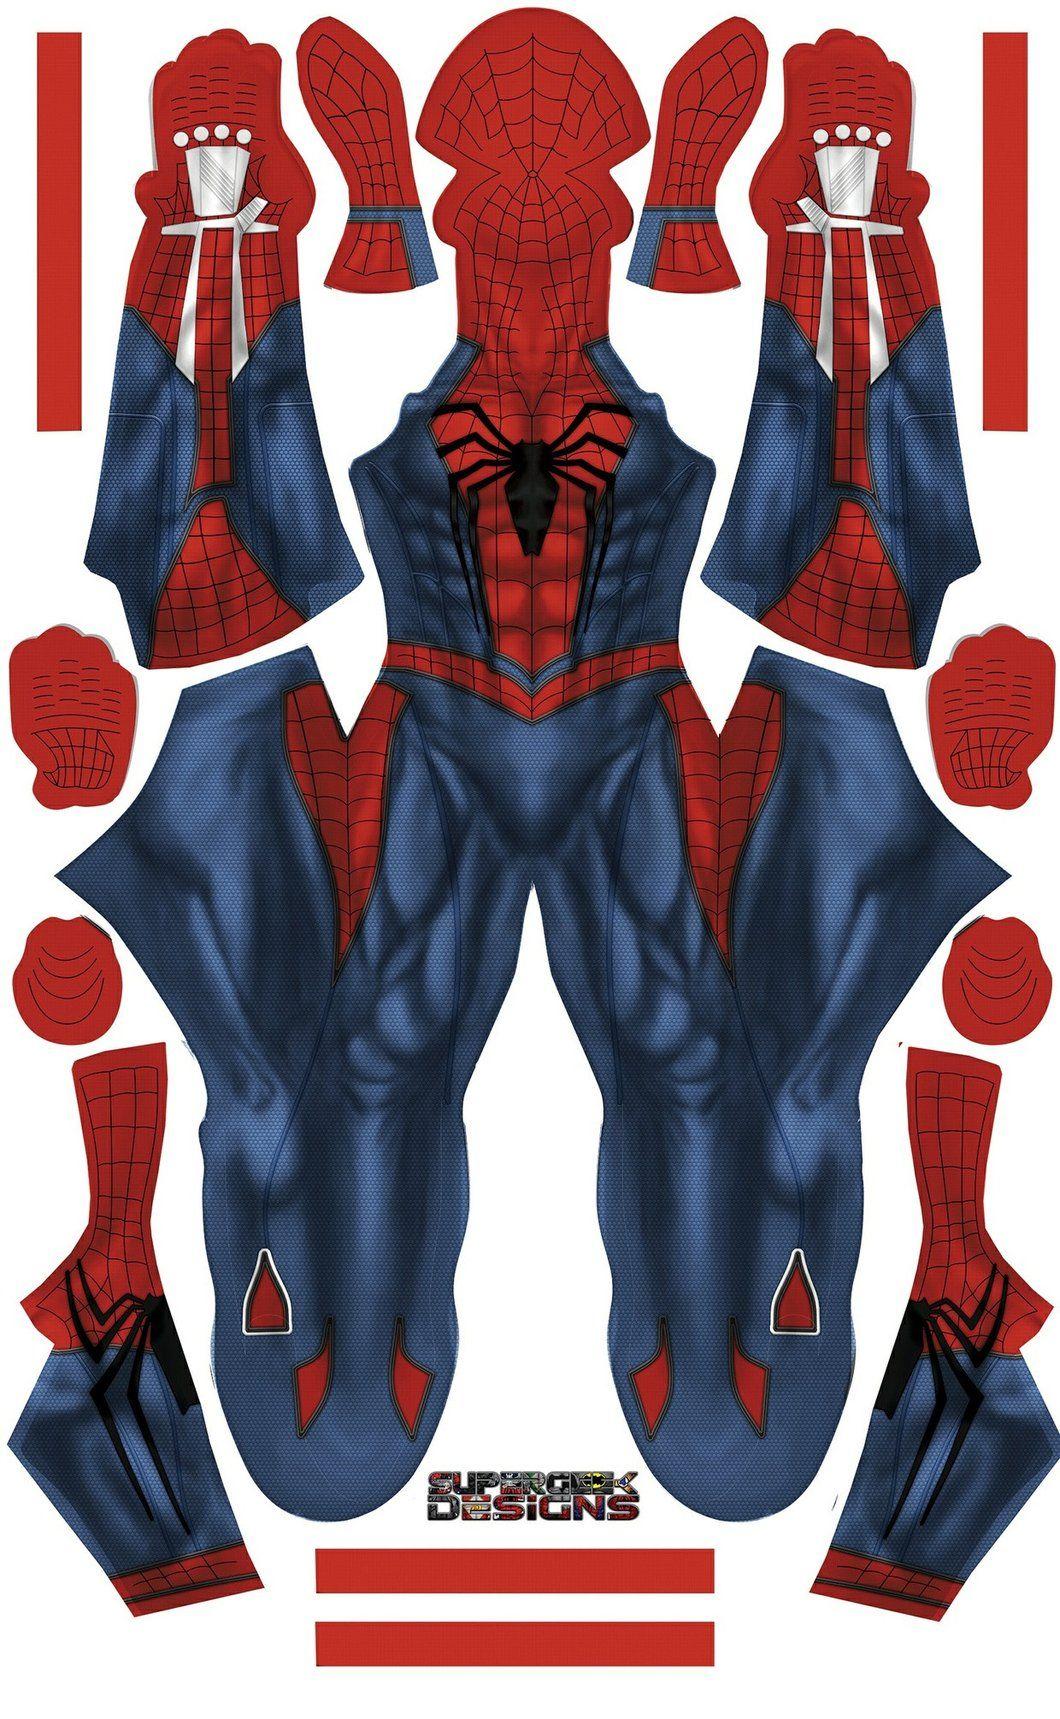 Spider-Man - PS4 Insomnia Game (Black Parts)   Marvel